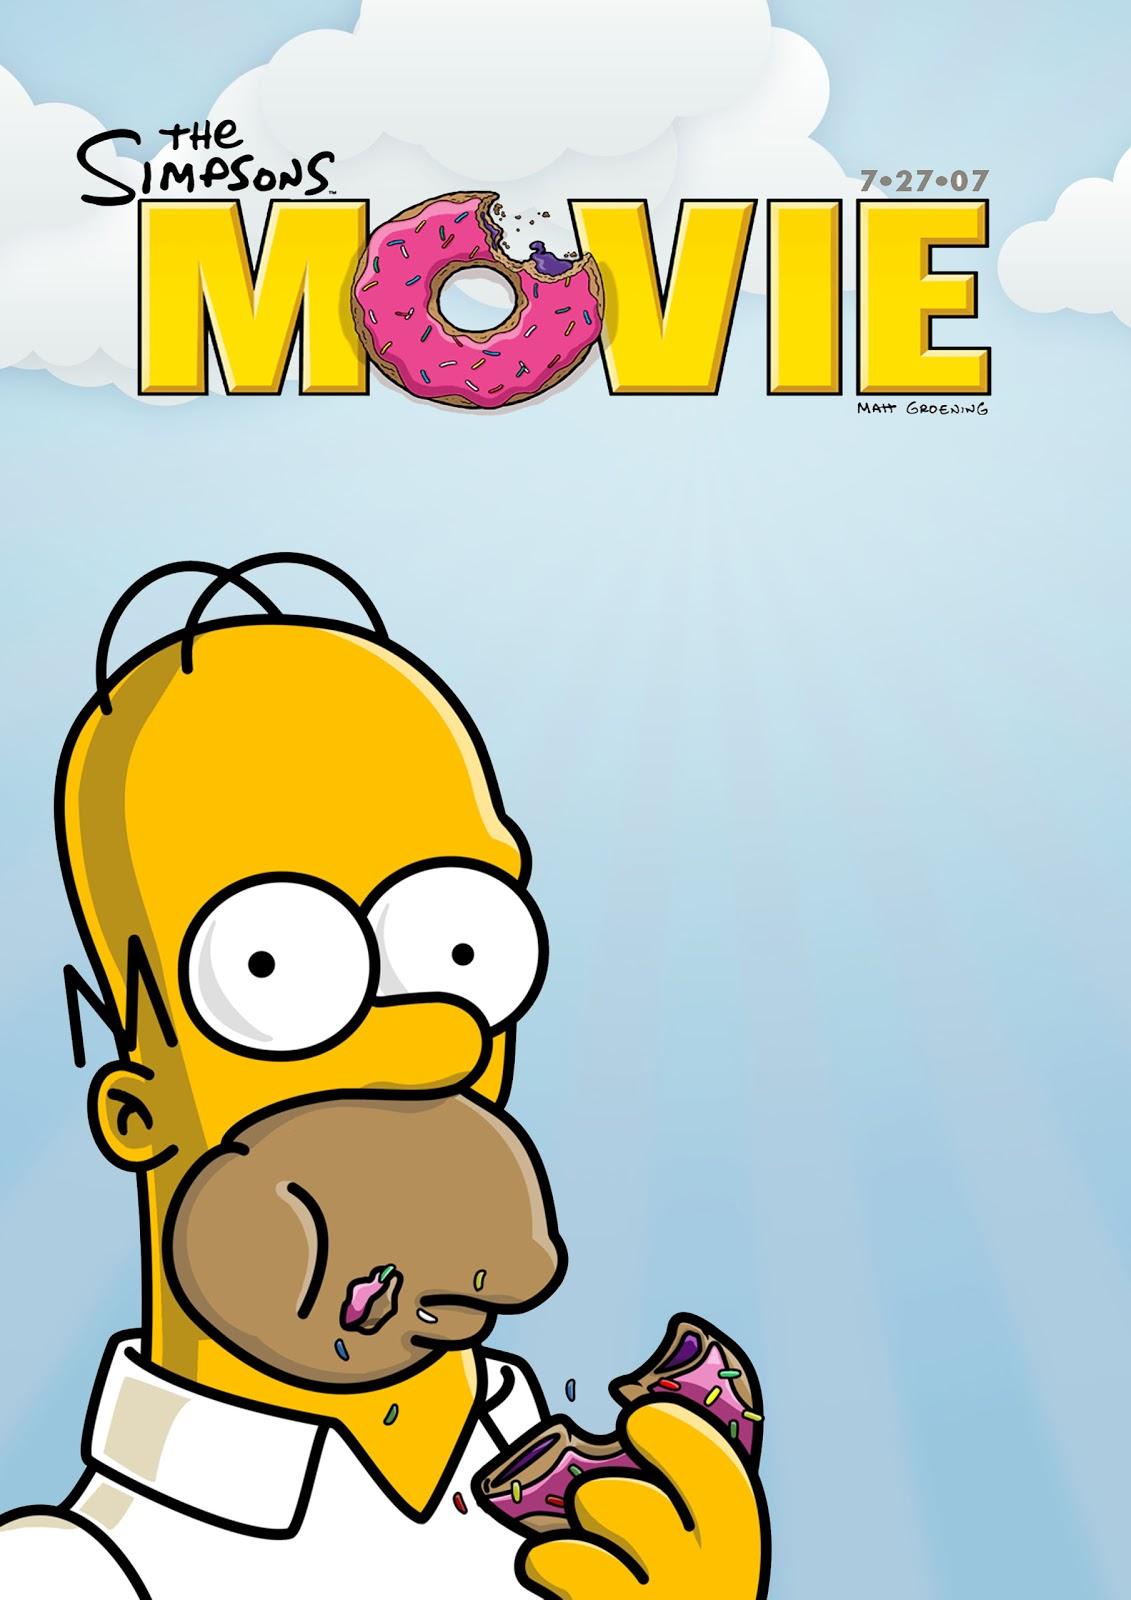 Bethany Thompson As Media Photoshop Skills Development 2 The Simpsons Movie Poster